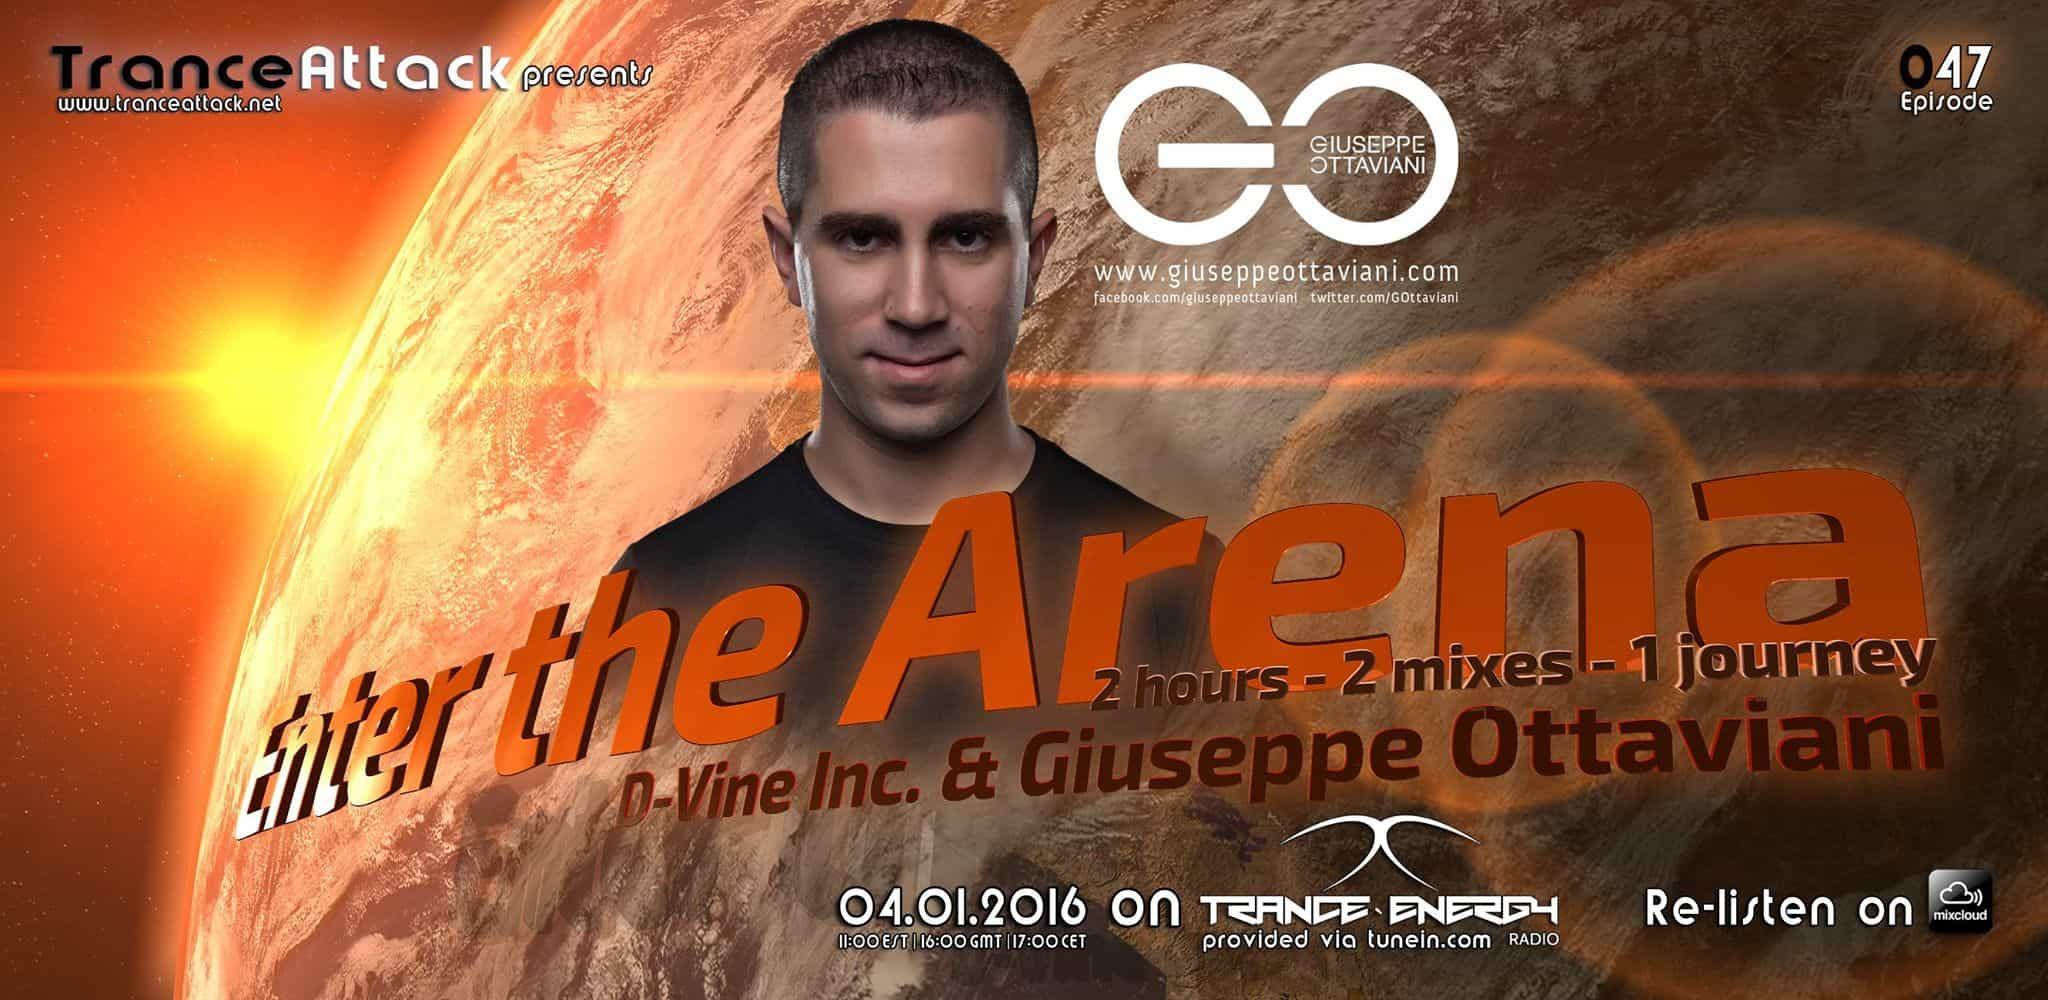 Enter The Arena 047 - D-Vine Inc. & Giuseppe Ottaviani